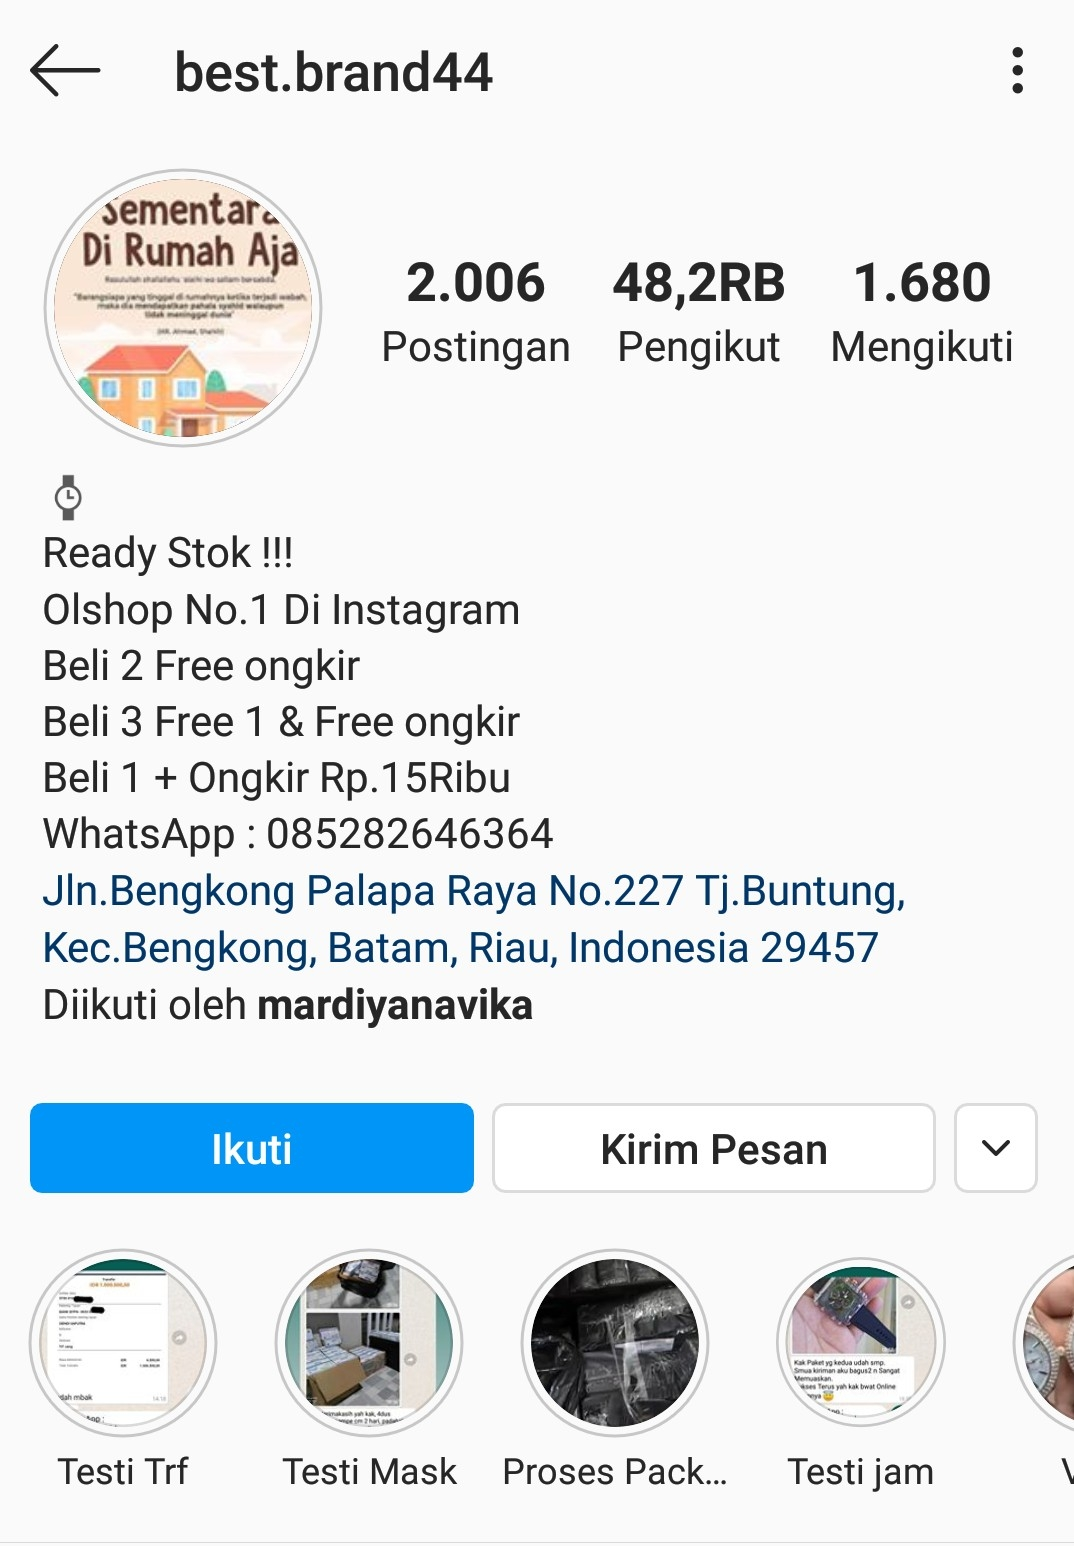 Best Brand44 Akun Instagram Penipu Masker Tukang Tipu